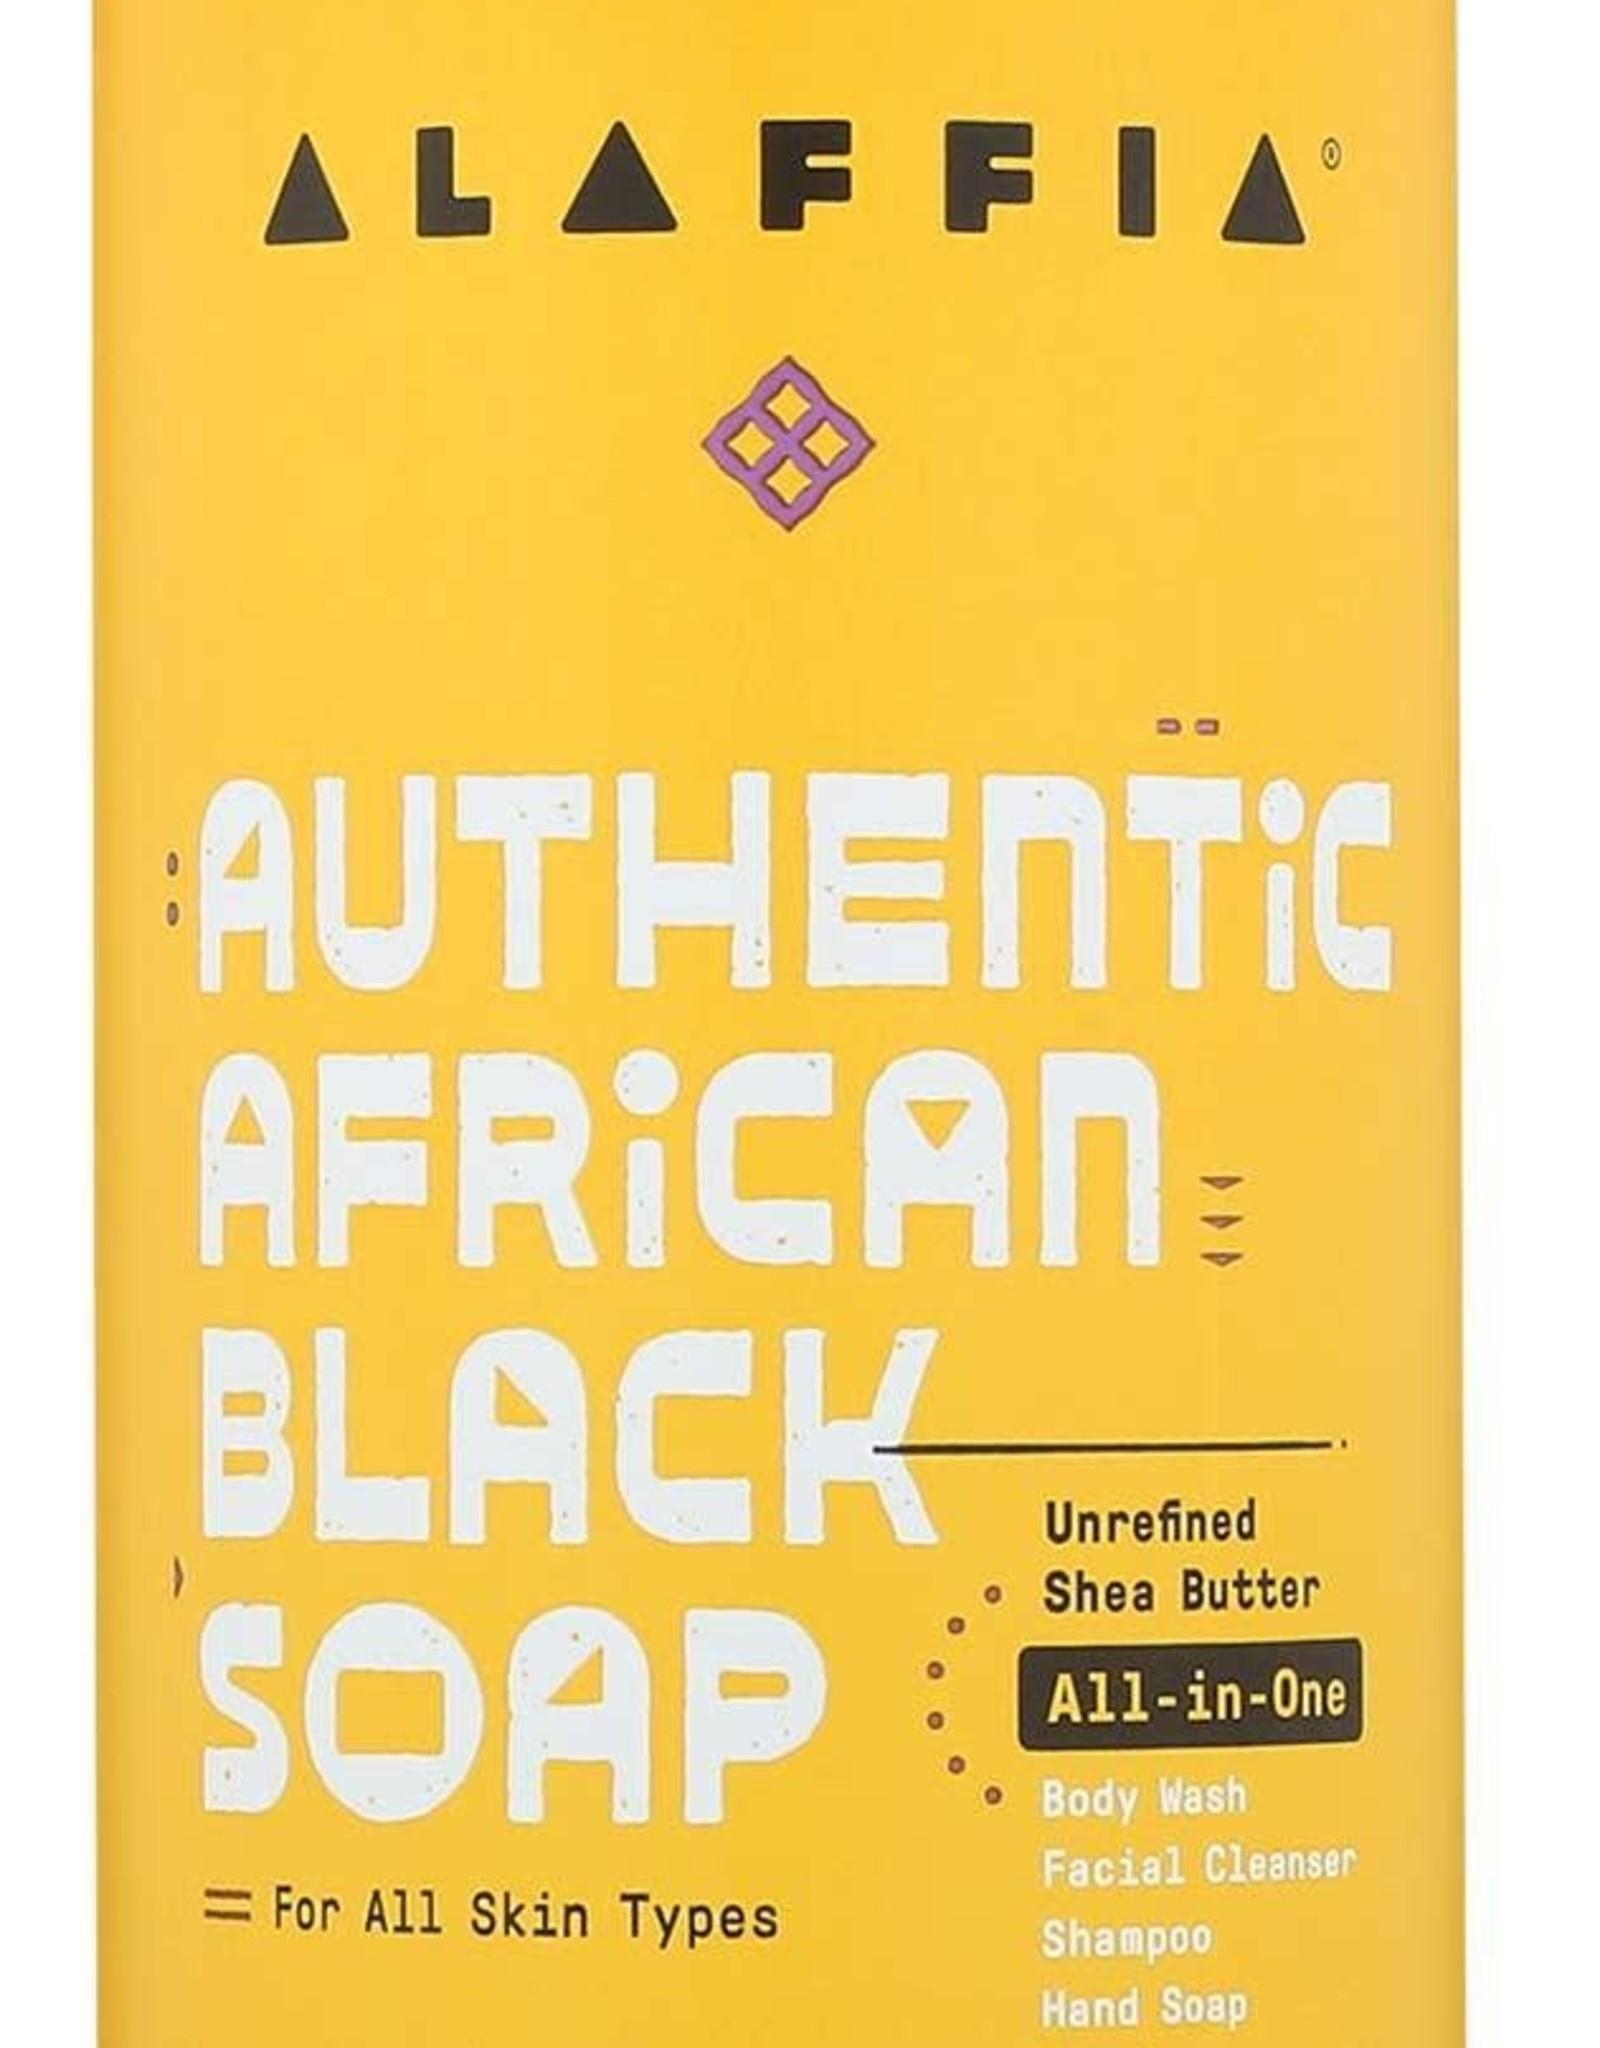 Alaffia Black Soap All-In-One Lavender Yling Ylang